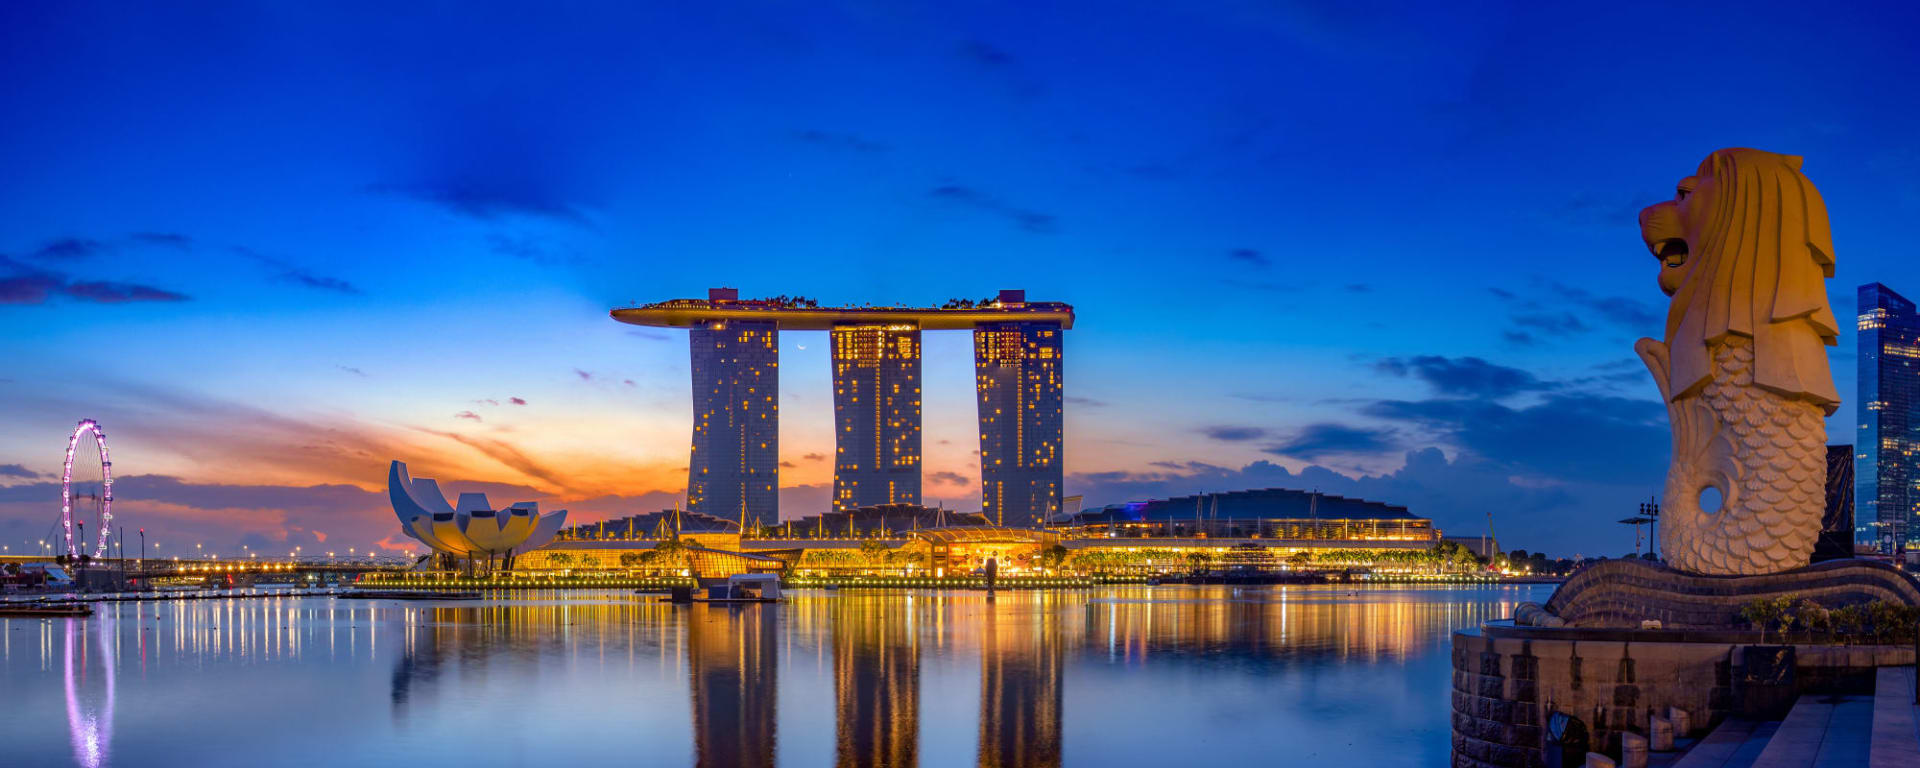 Singapur bei Nacht, EN, Halbtägig: Singapur Marina Bay bei Nacht